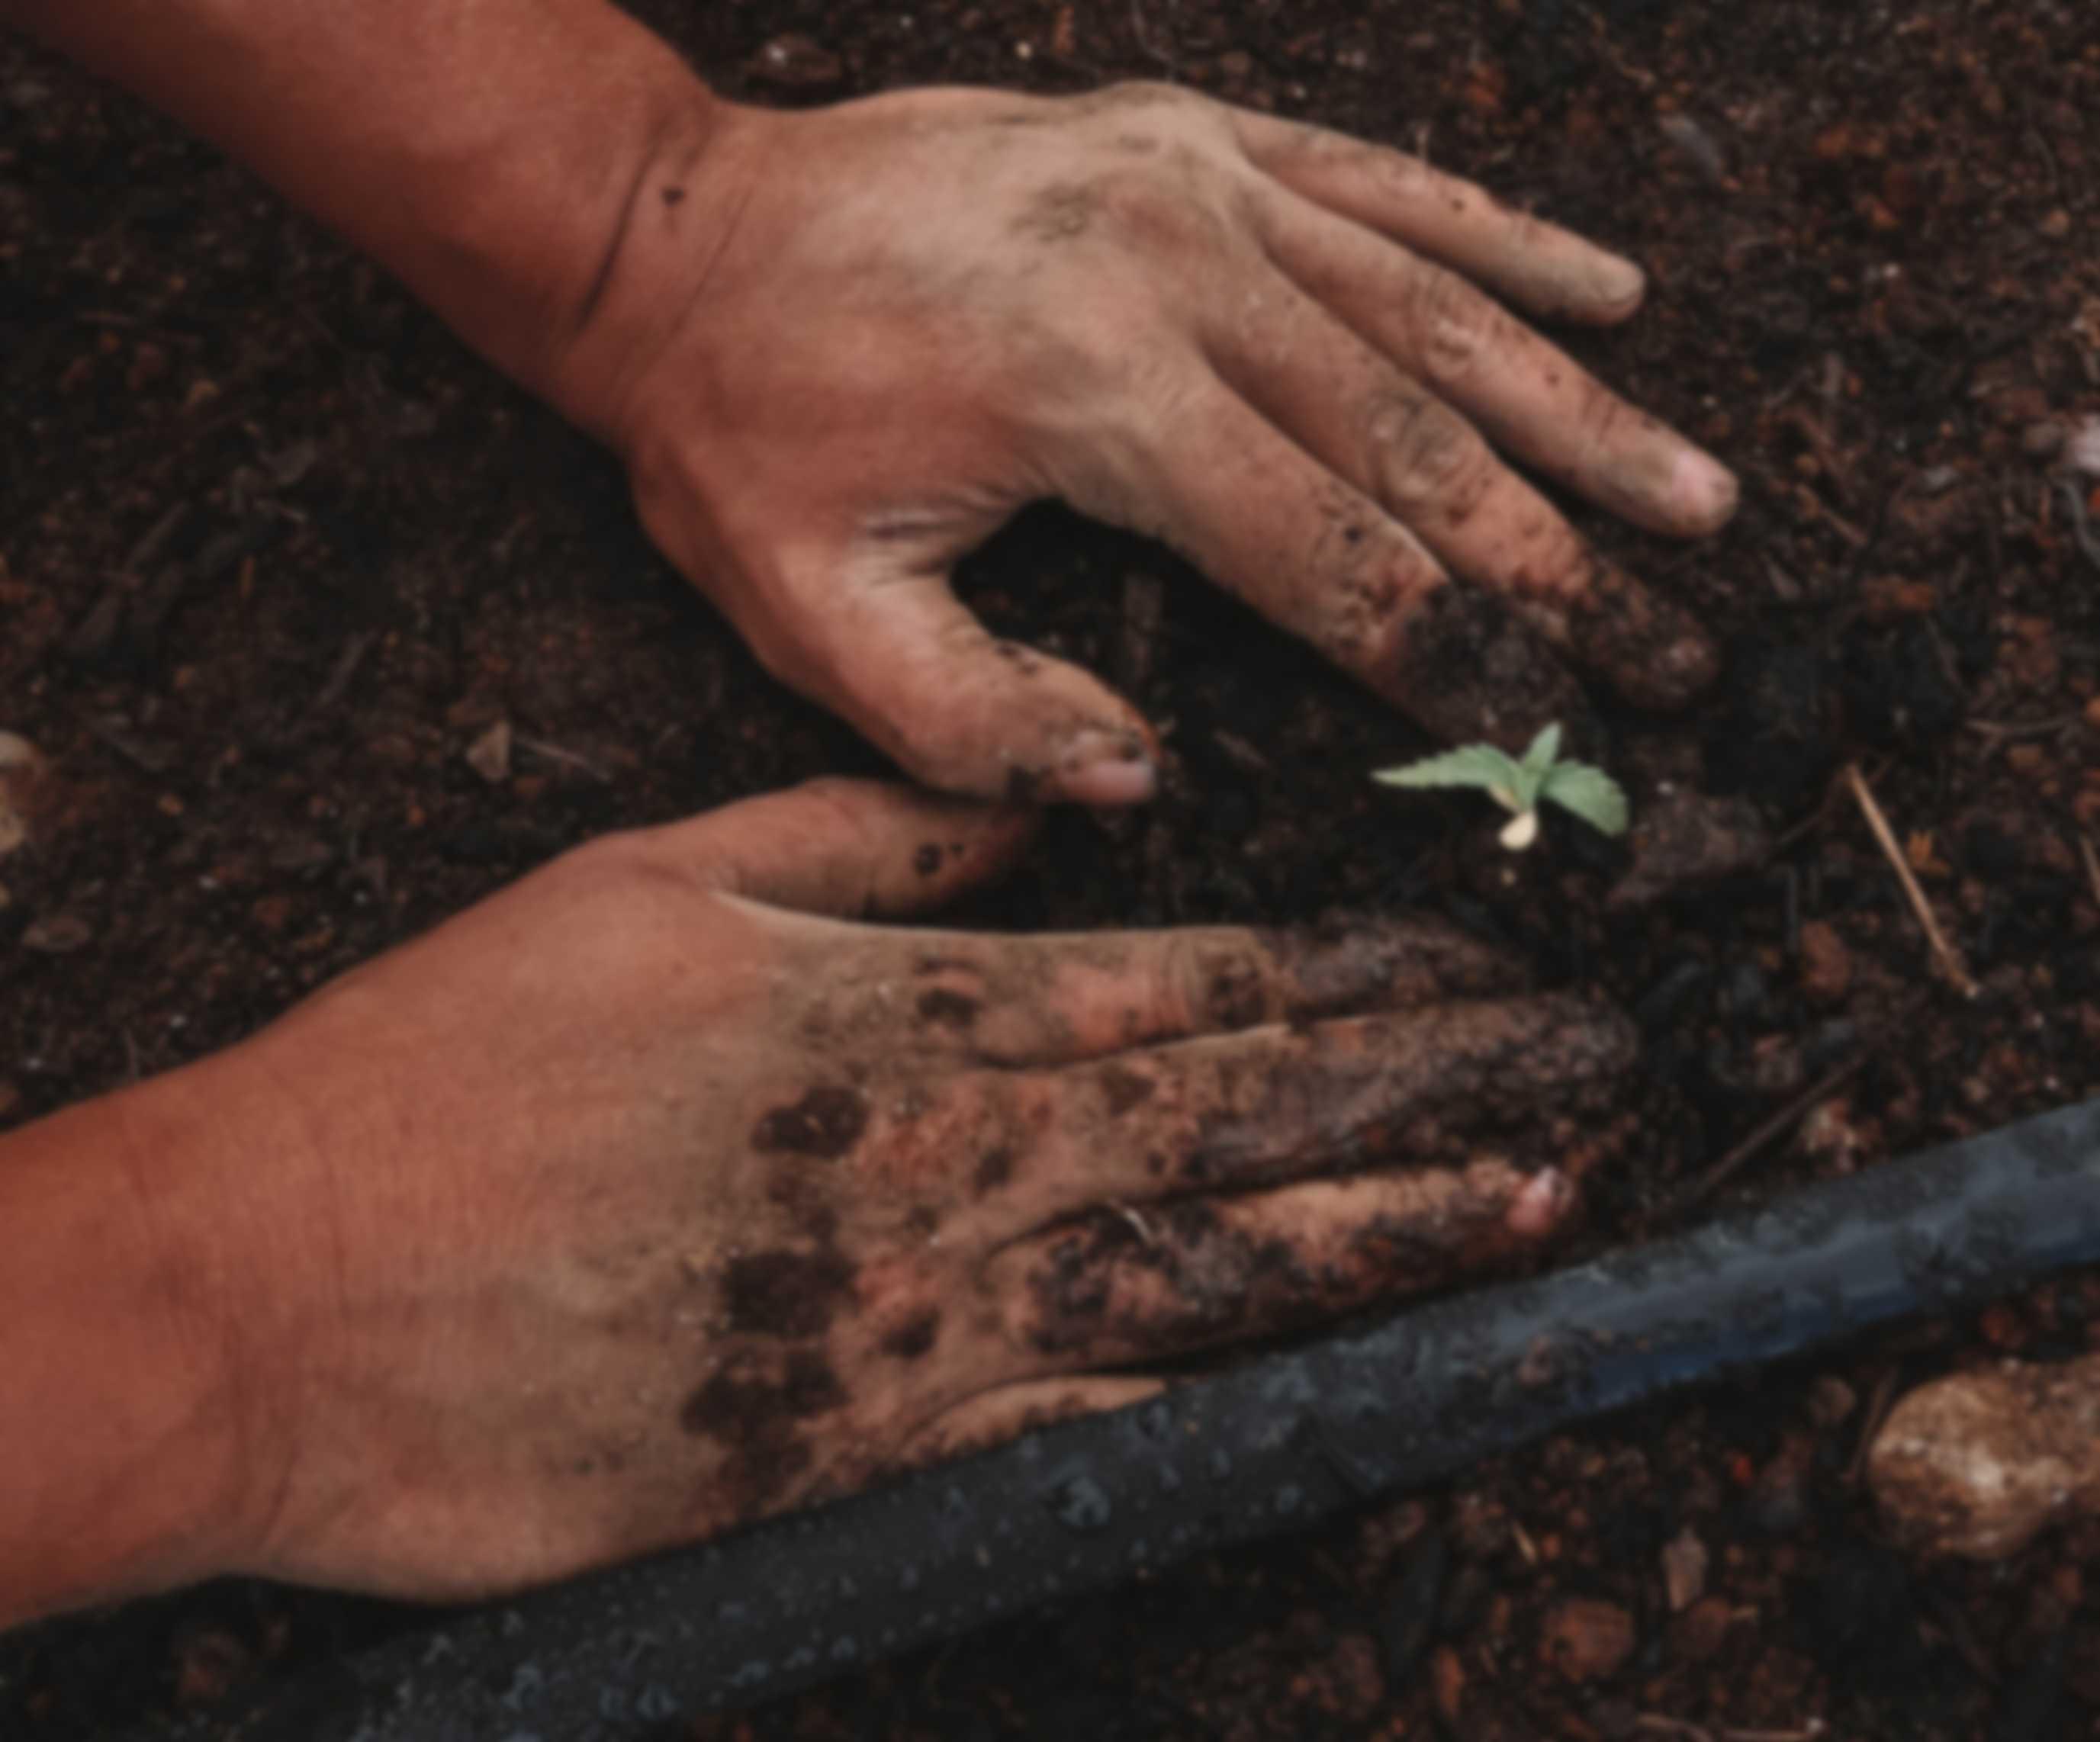 Is Hemp legal to grow?